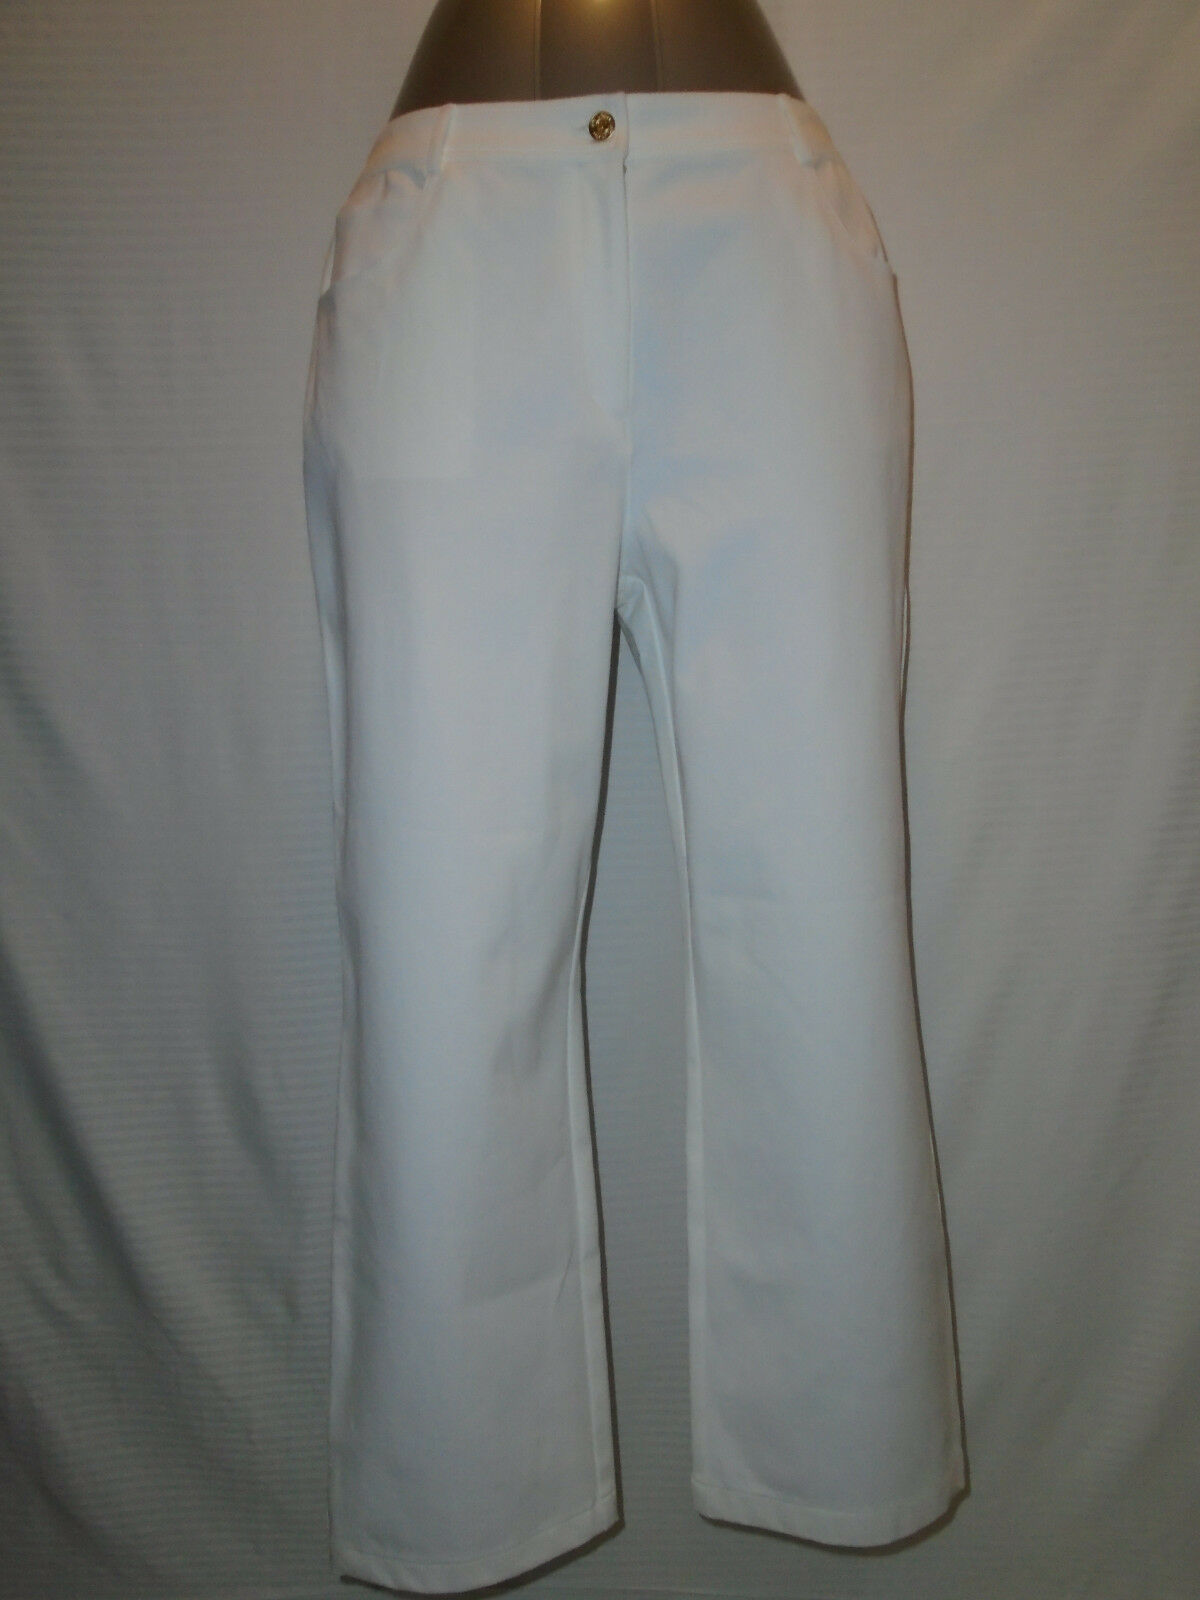 New St. John Womans Bright Weiß Marie Dress Pants Größe 14